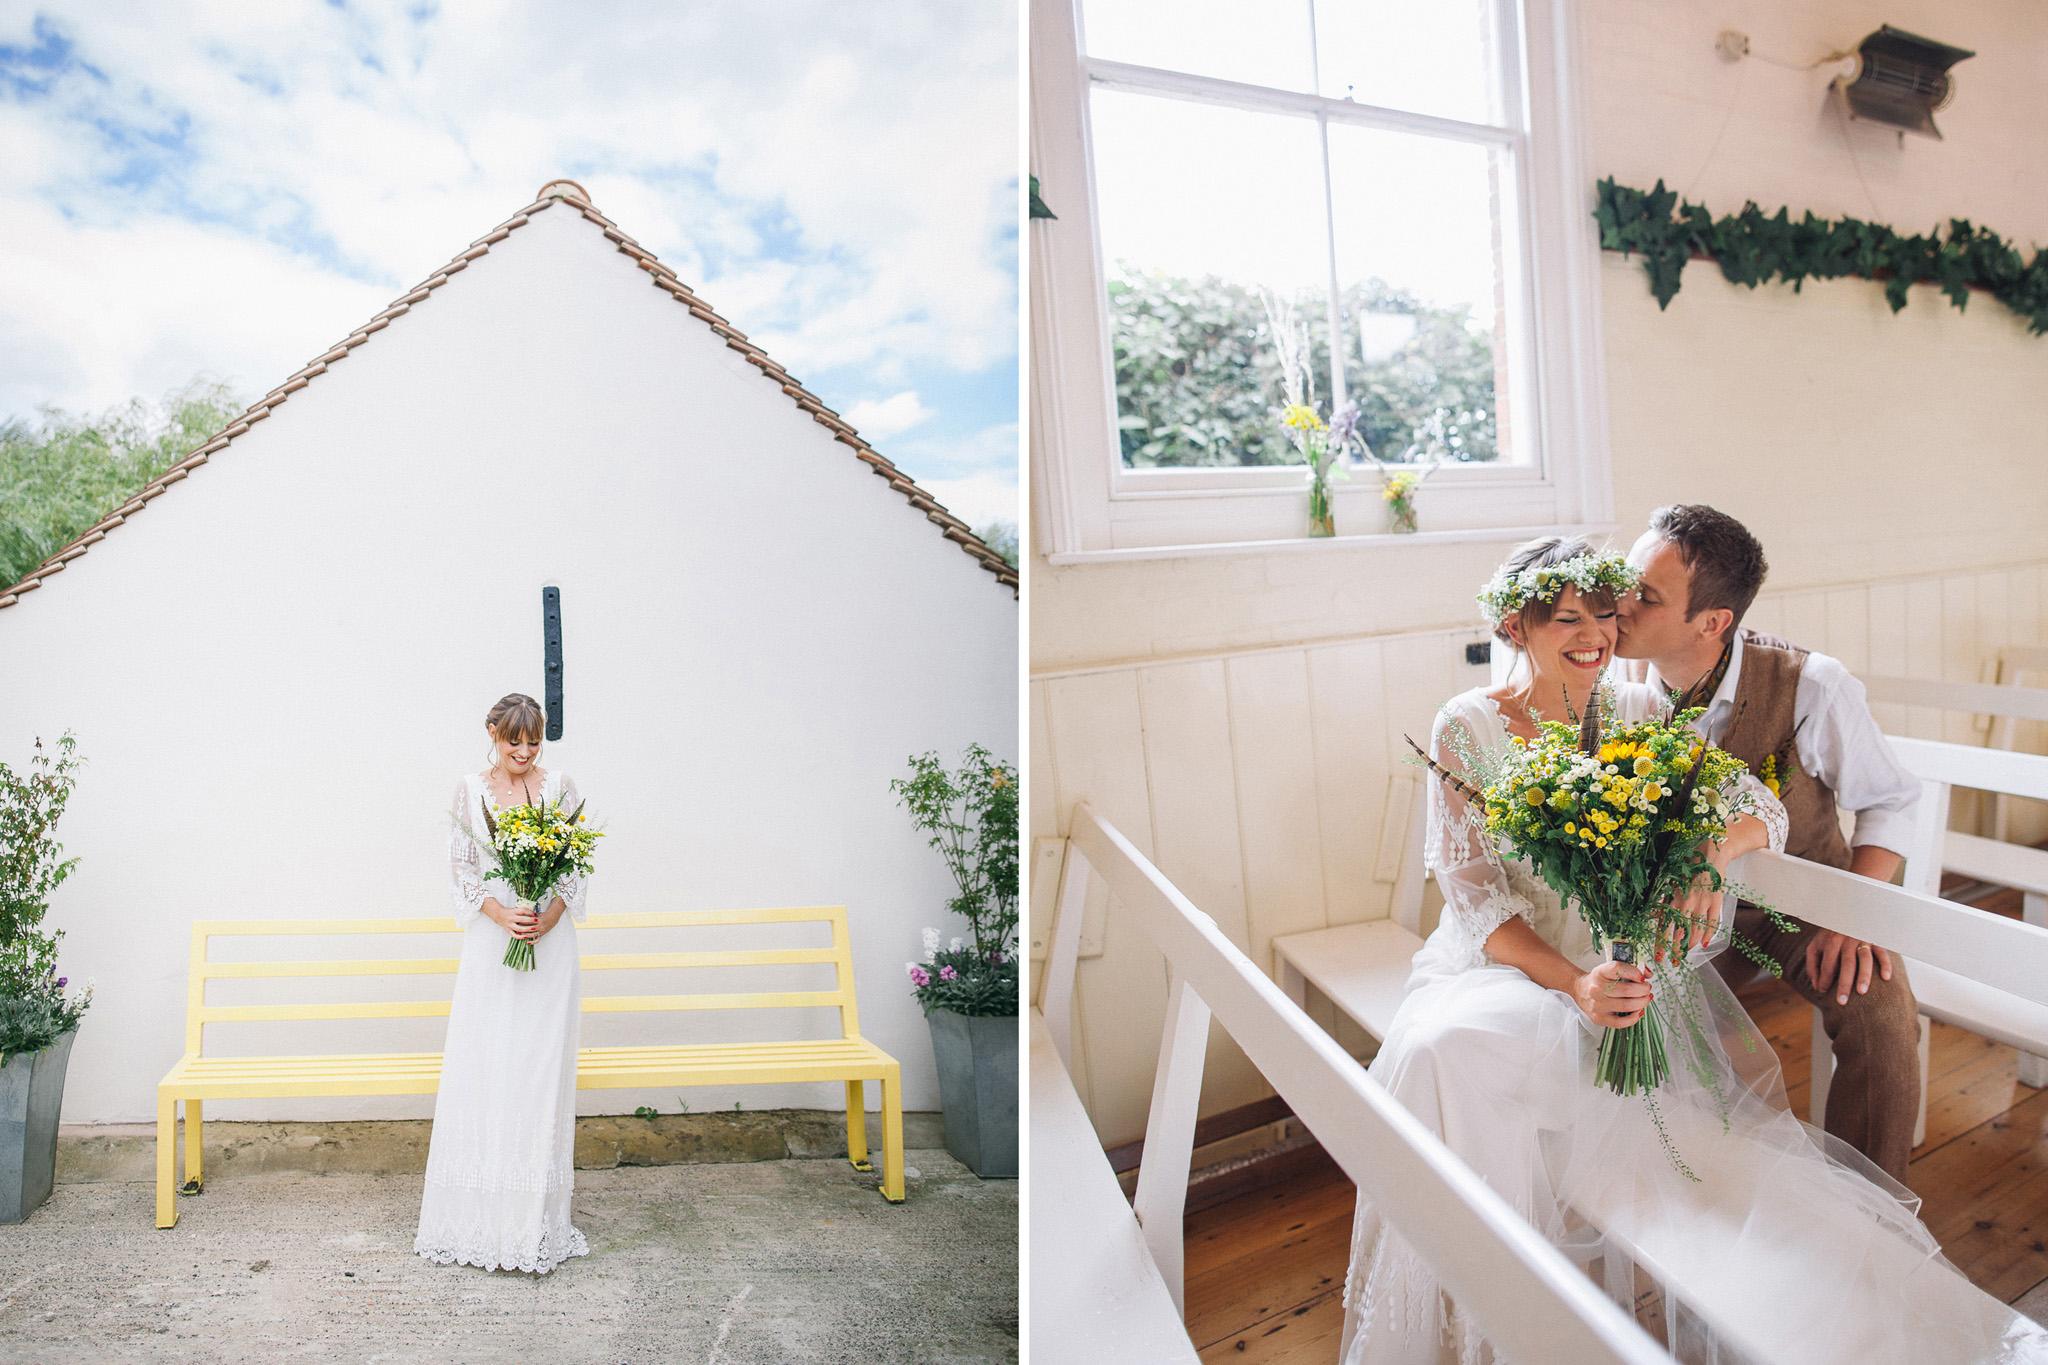 chantry_sussex_barn_wedding_322.jpg